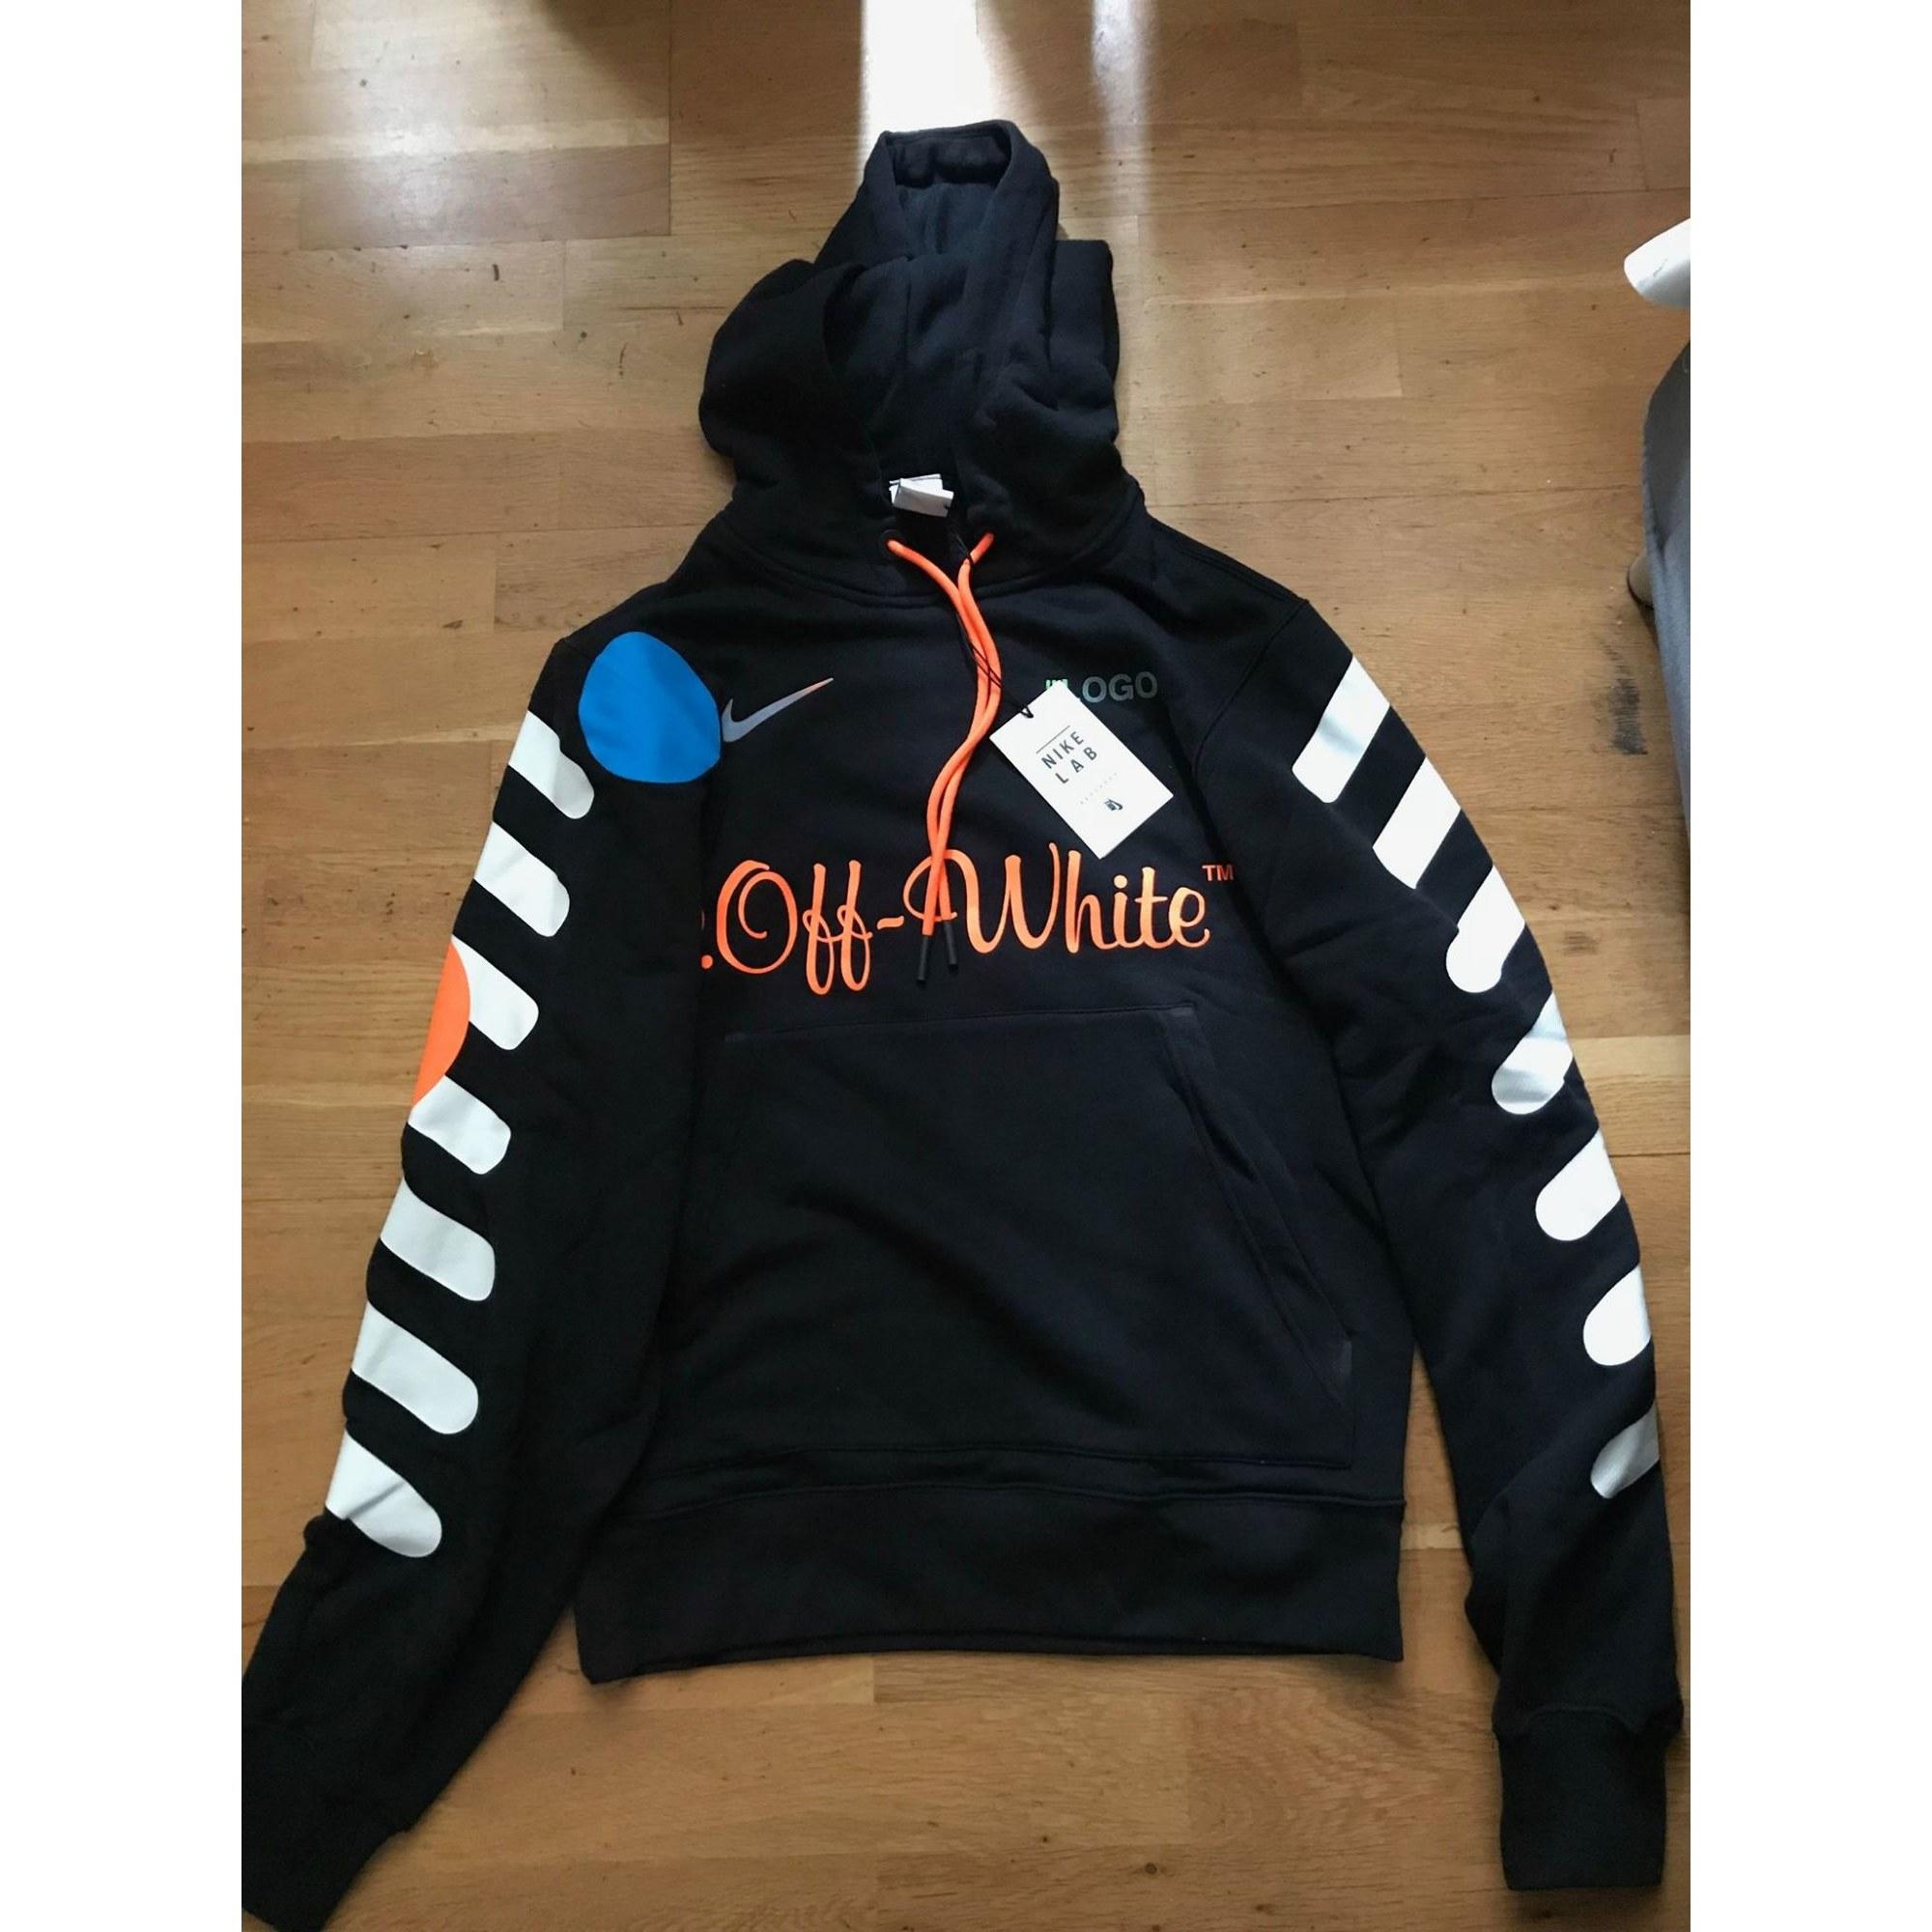 Sweat White Nike xs Off Noir 7887131 0 X wpqwSxa6